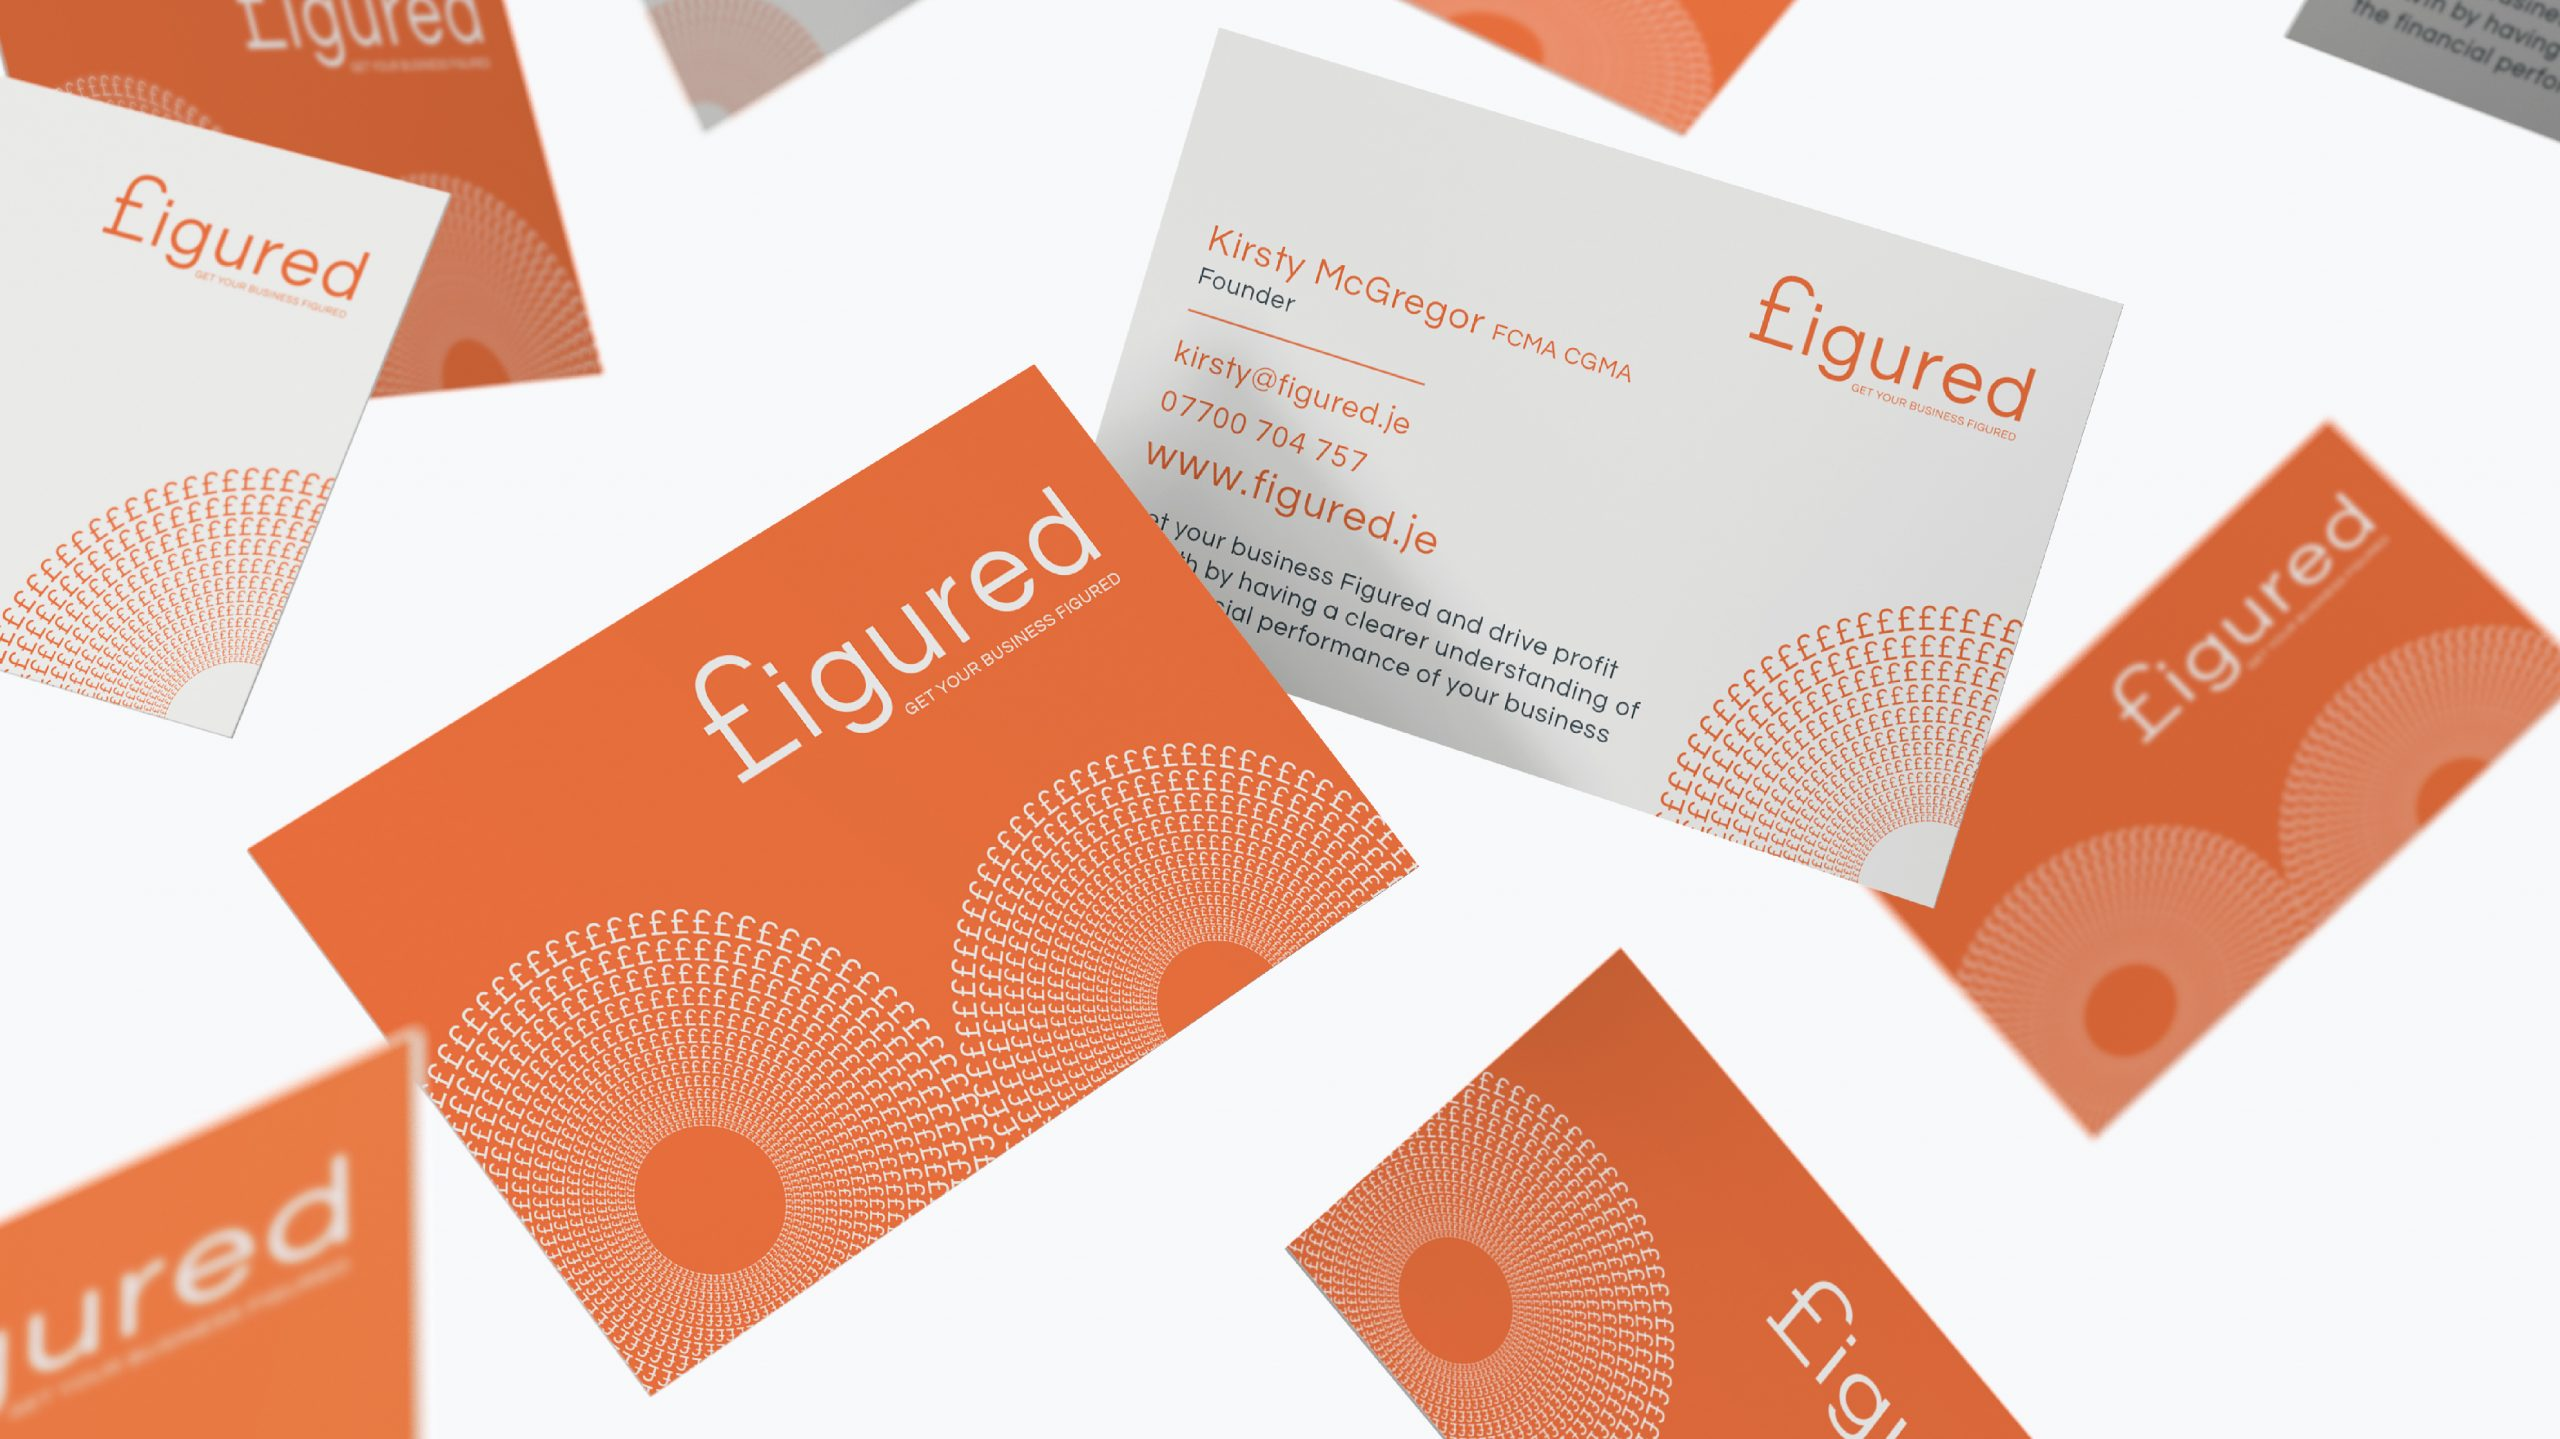 Quints Design co - Figured - Branded Stationery - Business Cards